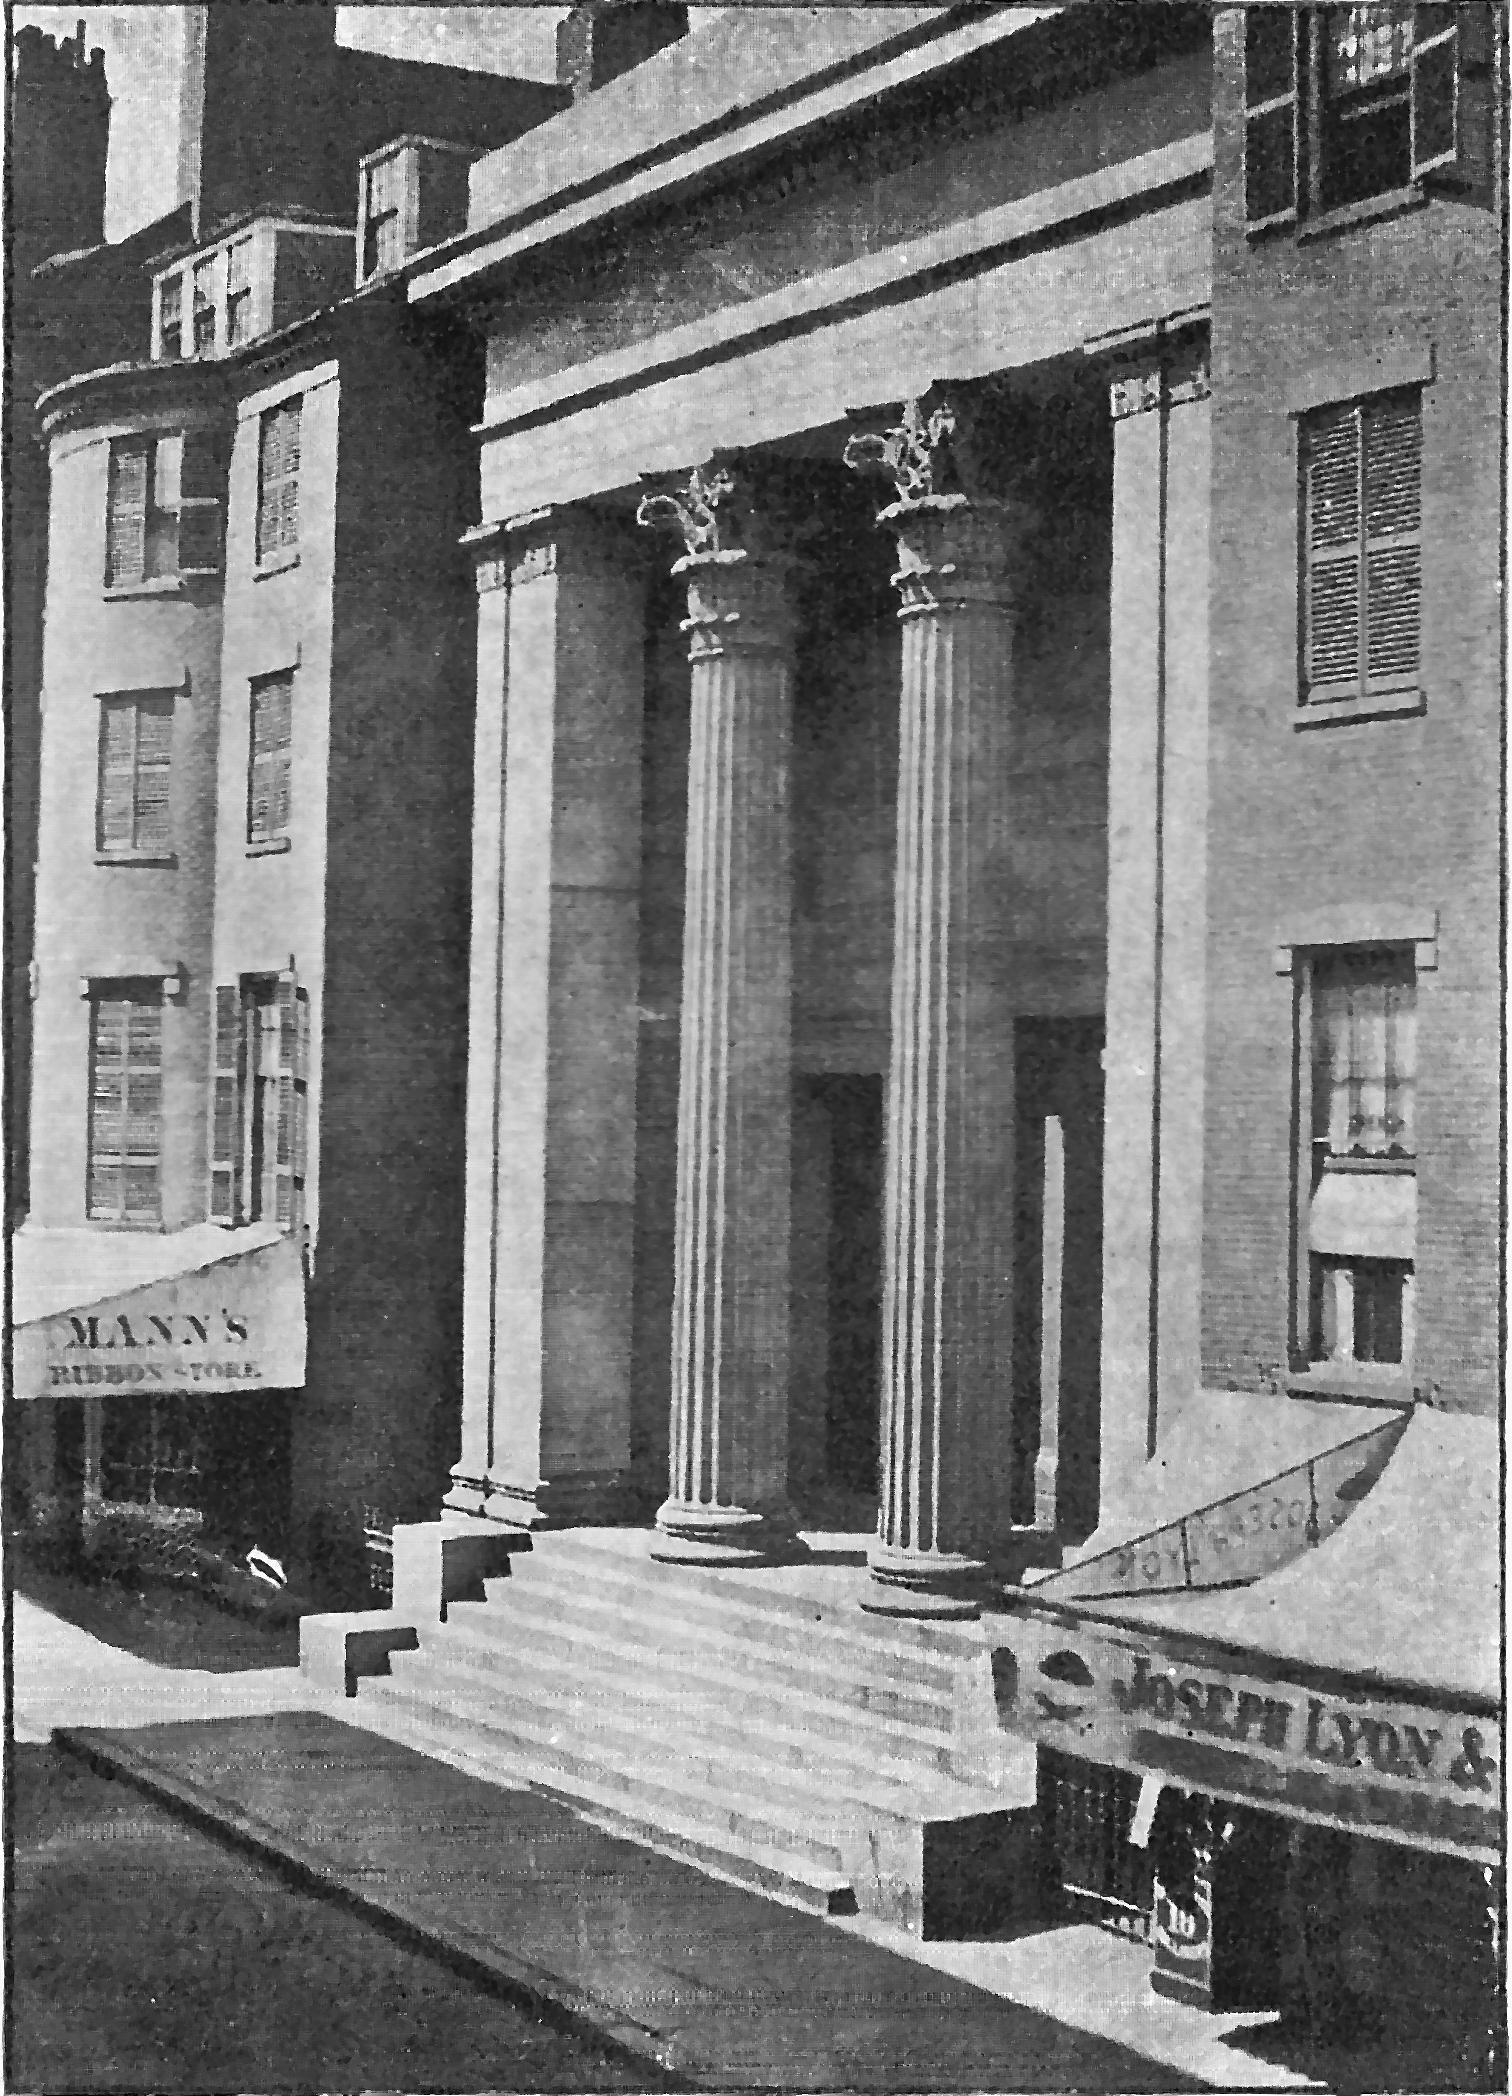 Winter Street 1842